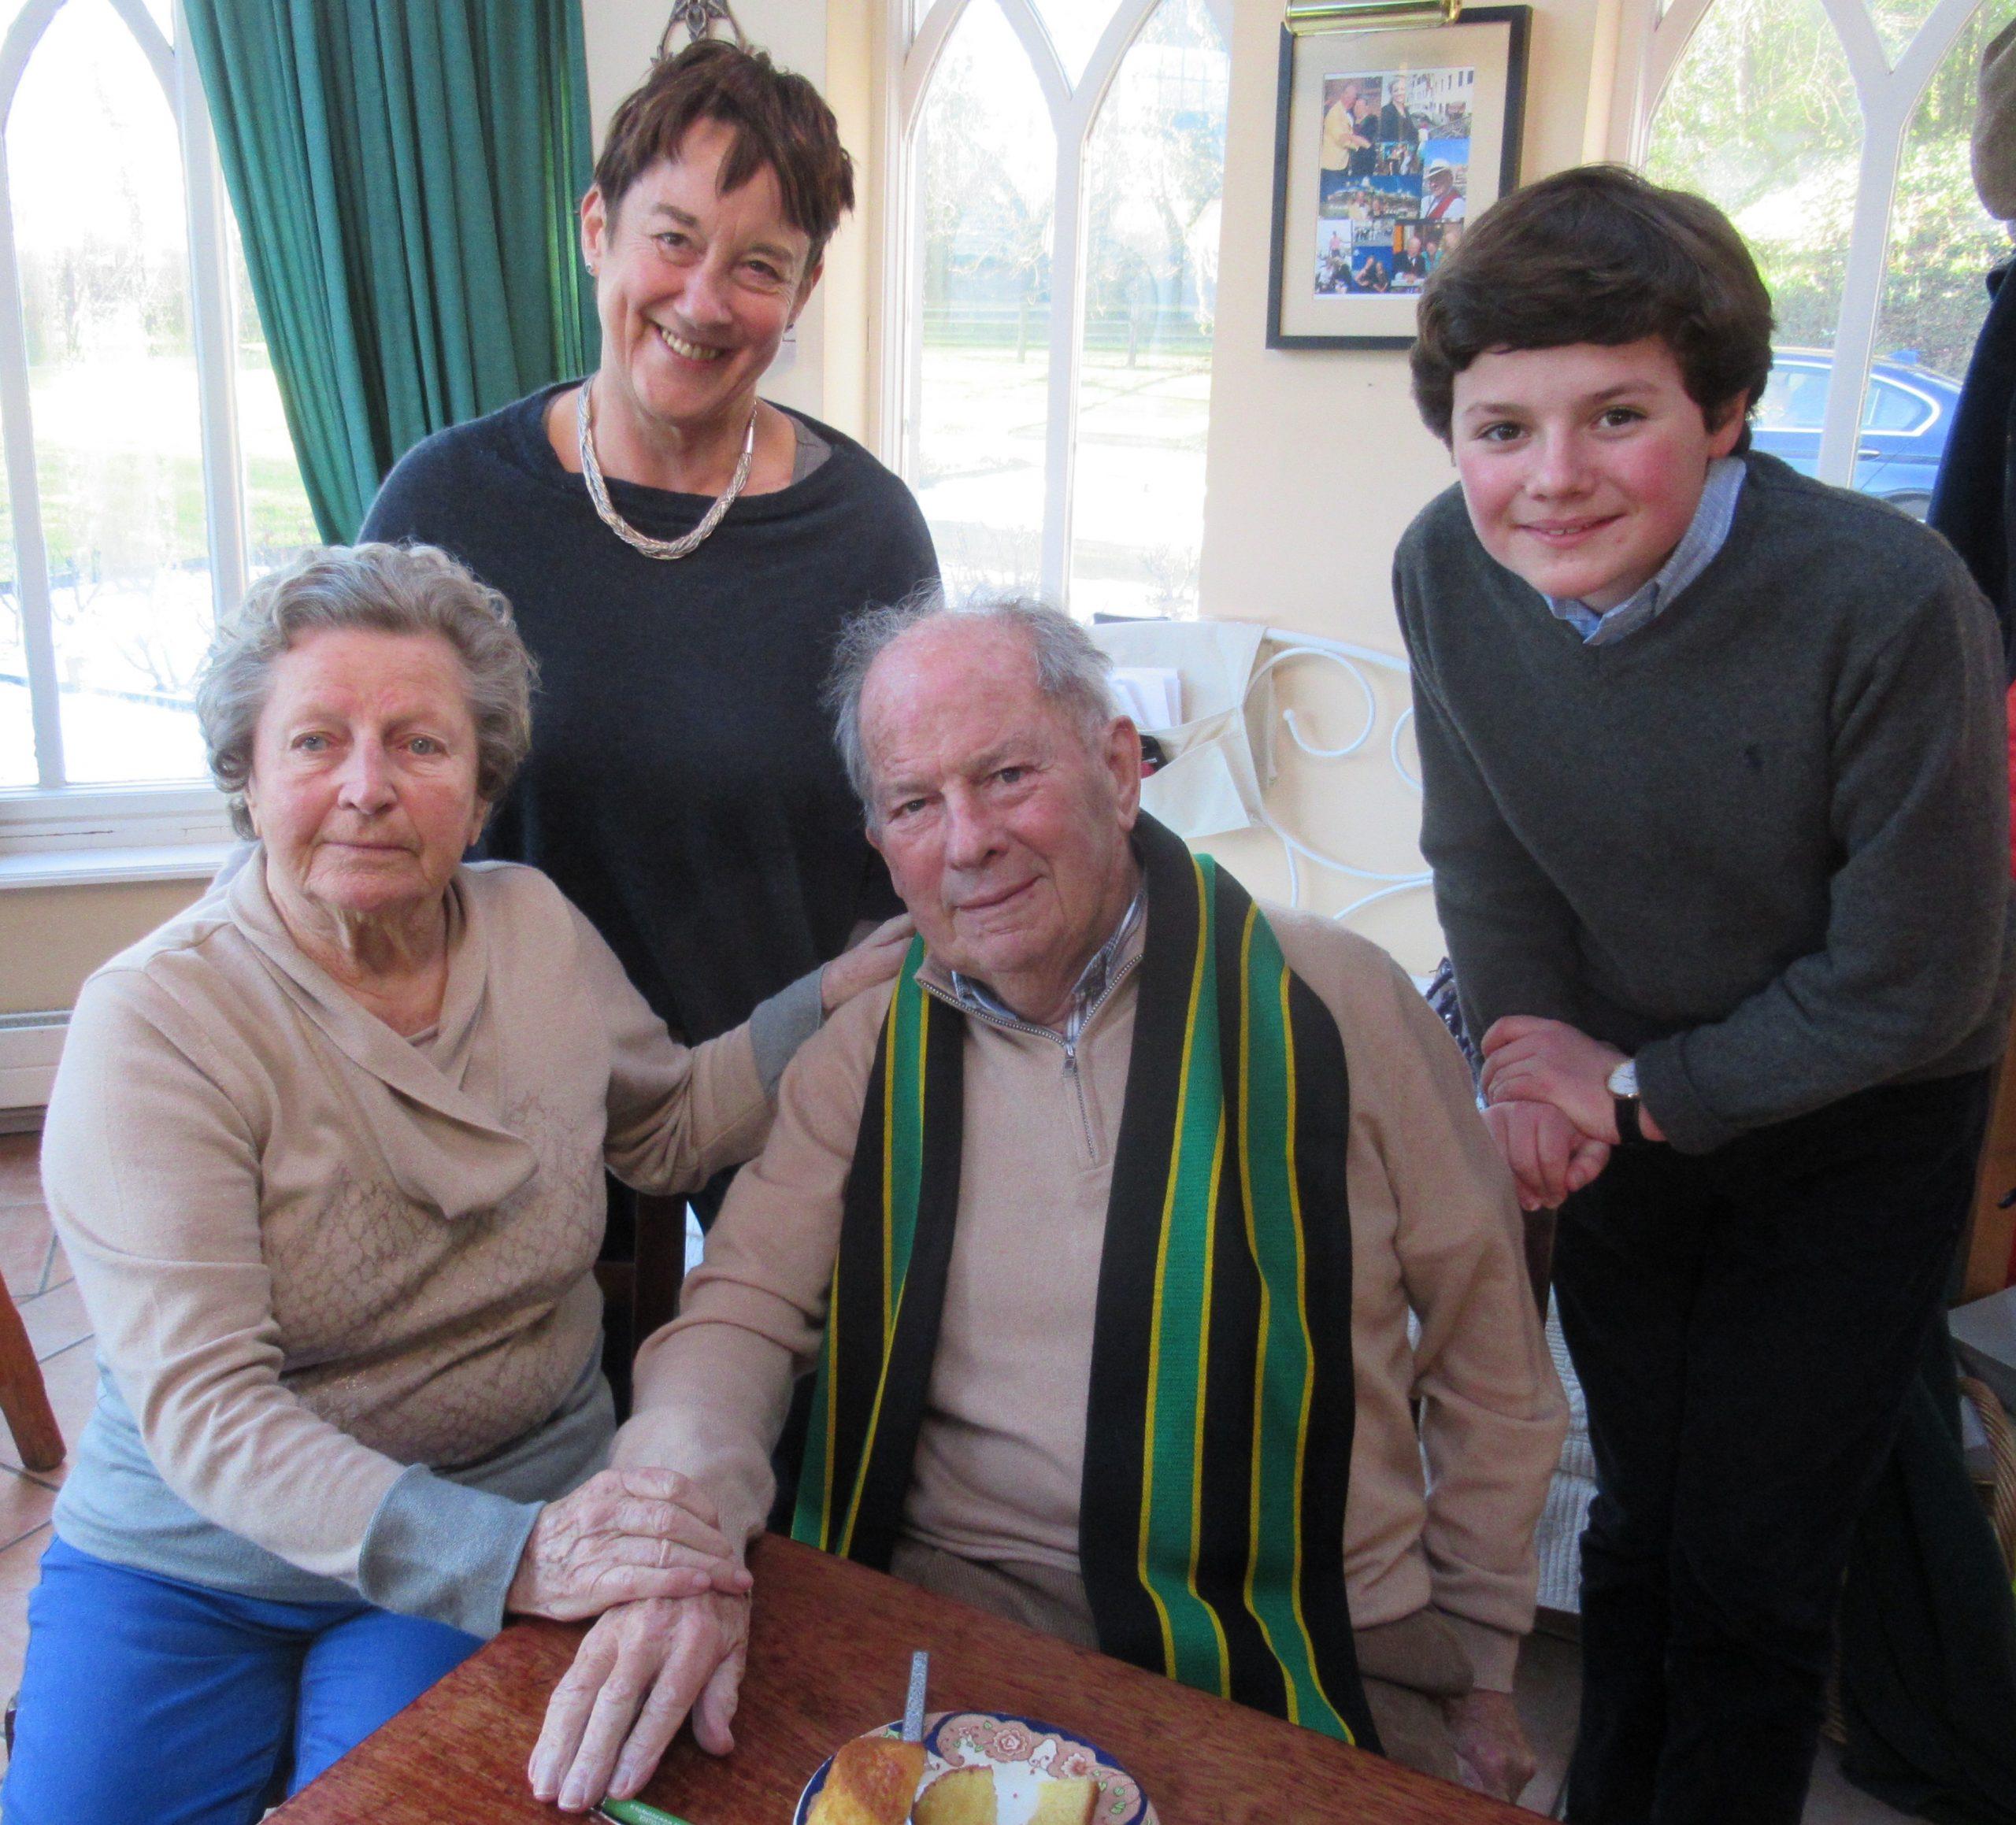 Ann Sheppard joins Basil, Maureen and Daniel Brindley